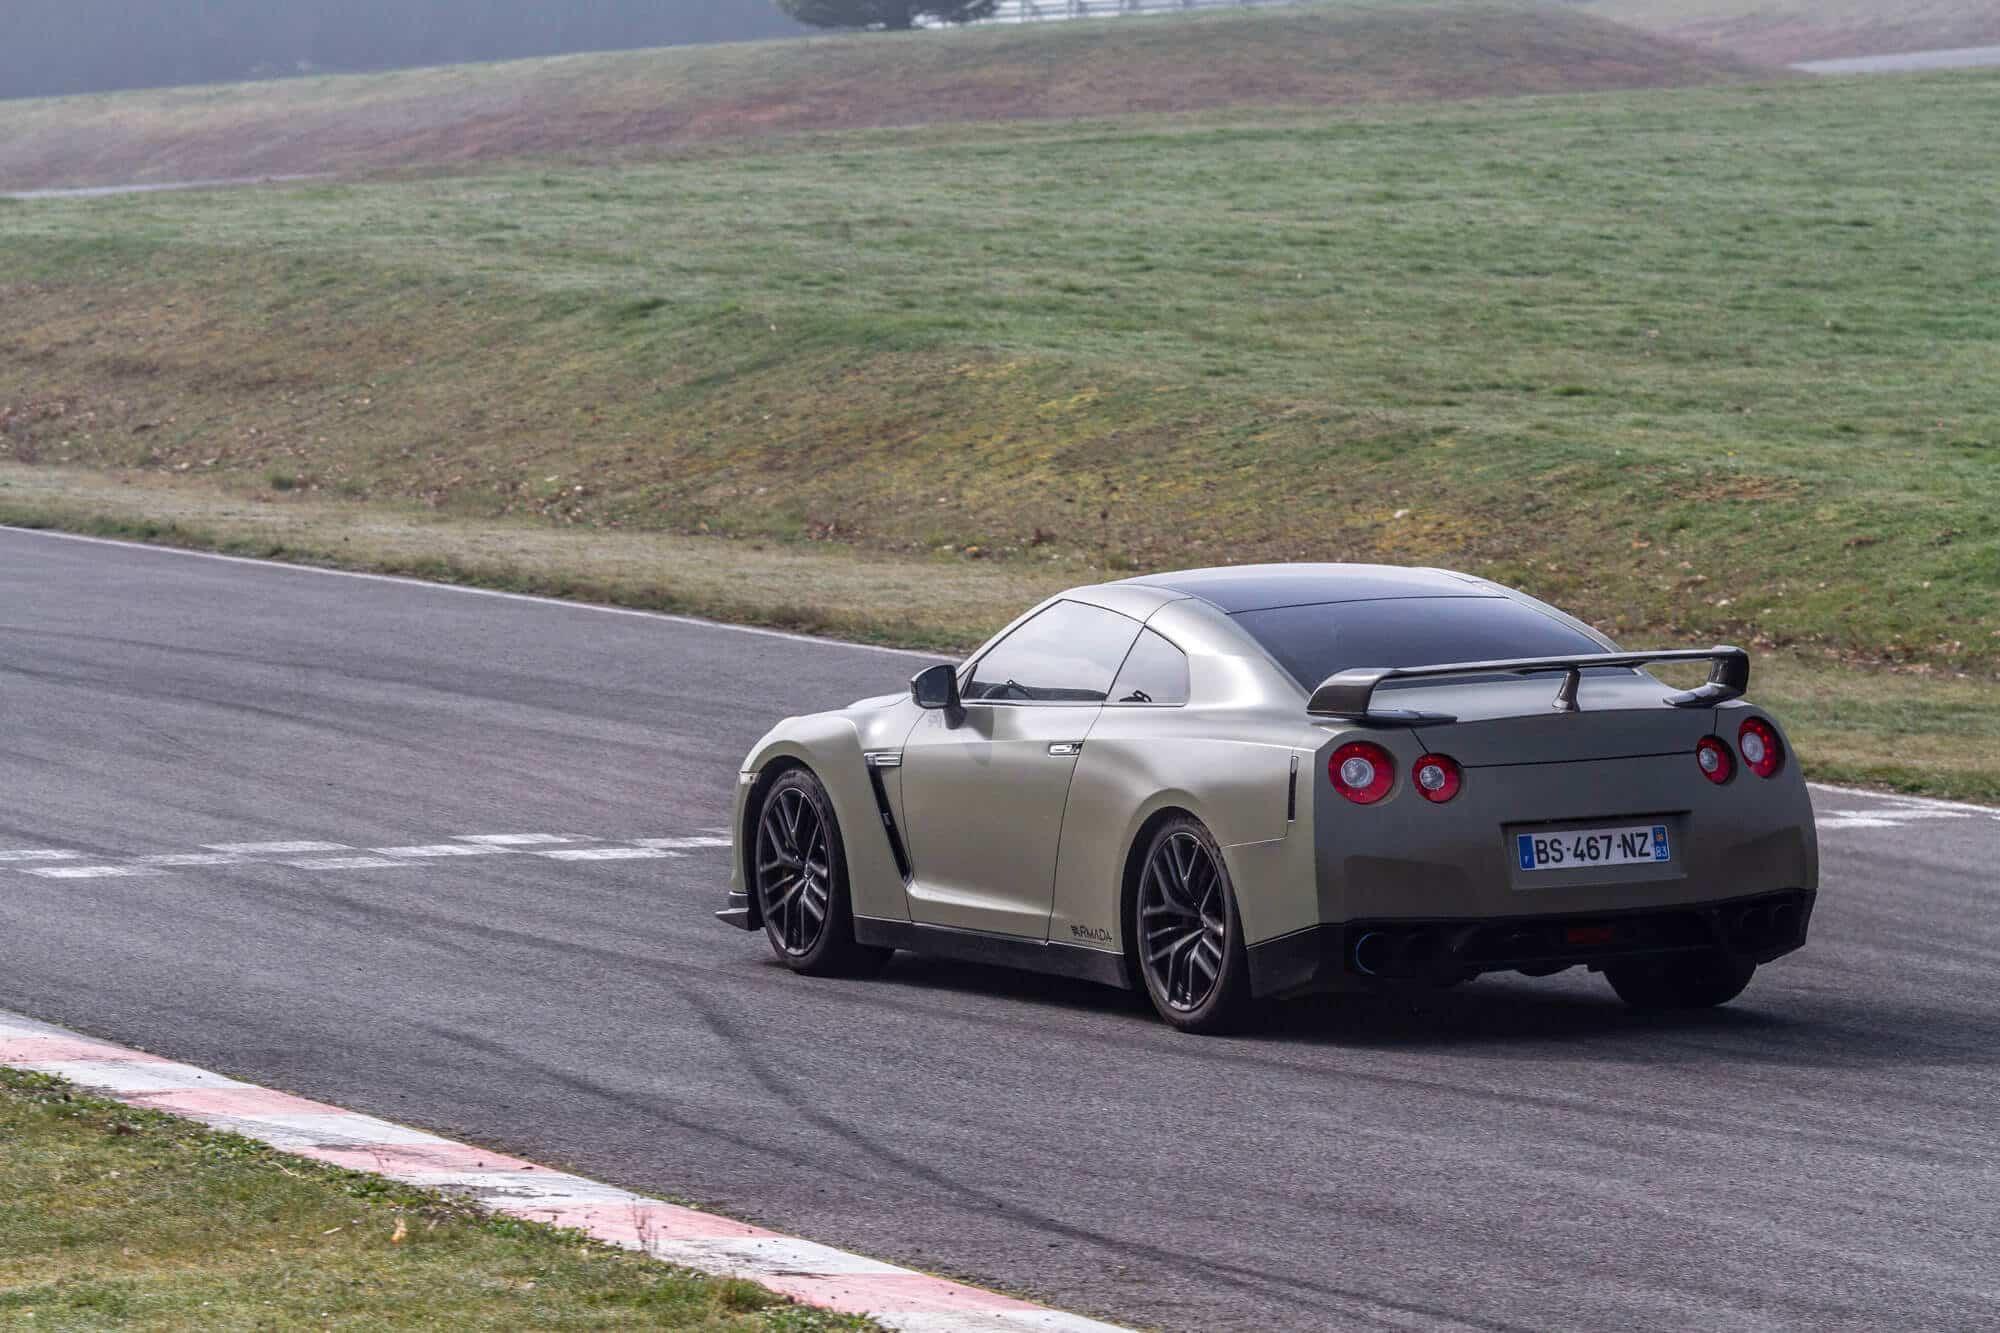 armada-racing-ronde-des-belles-2019-nissan-GTR-5